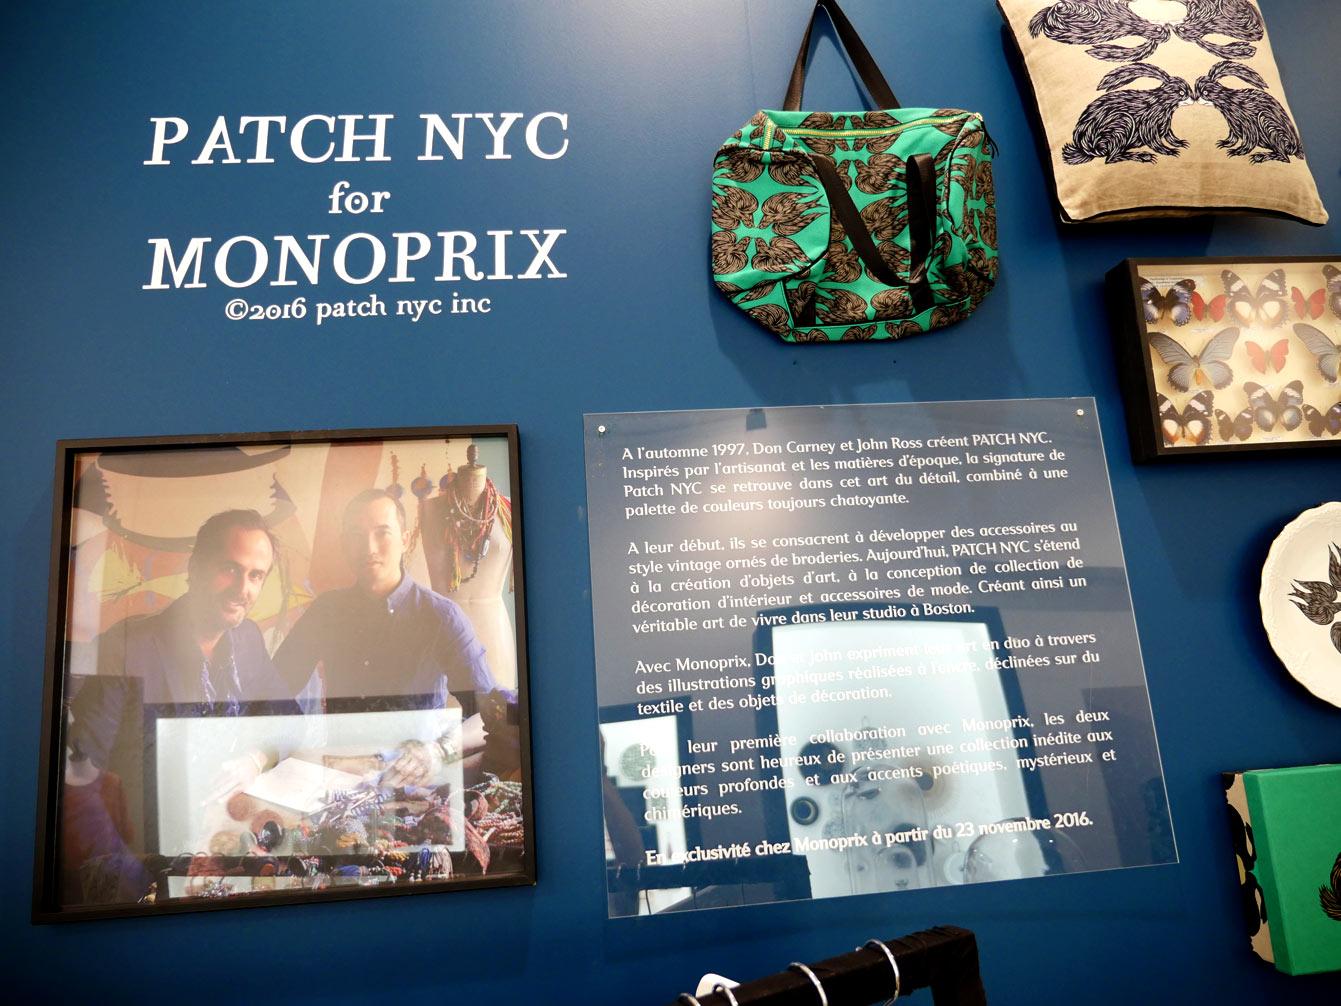 noel-monoprix-vaisselle-patch-nyc-54